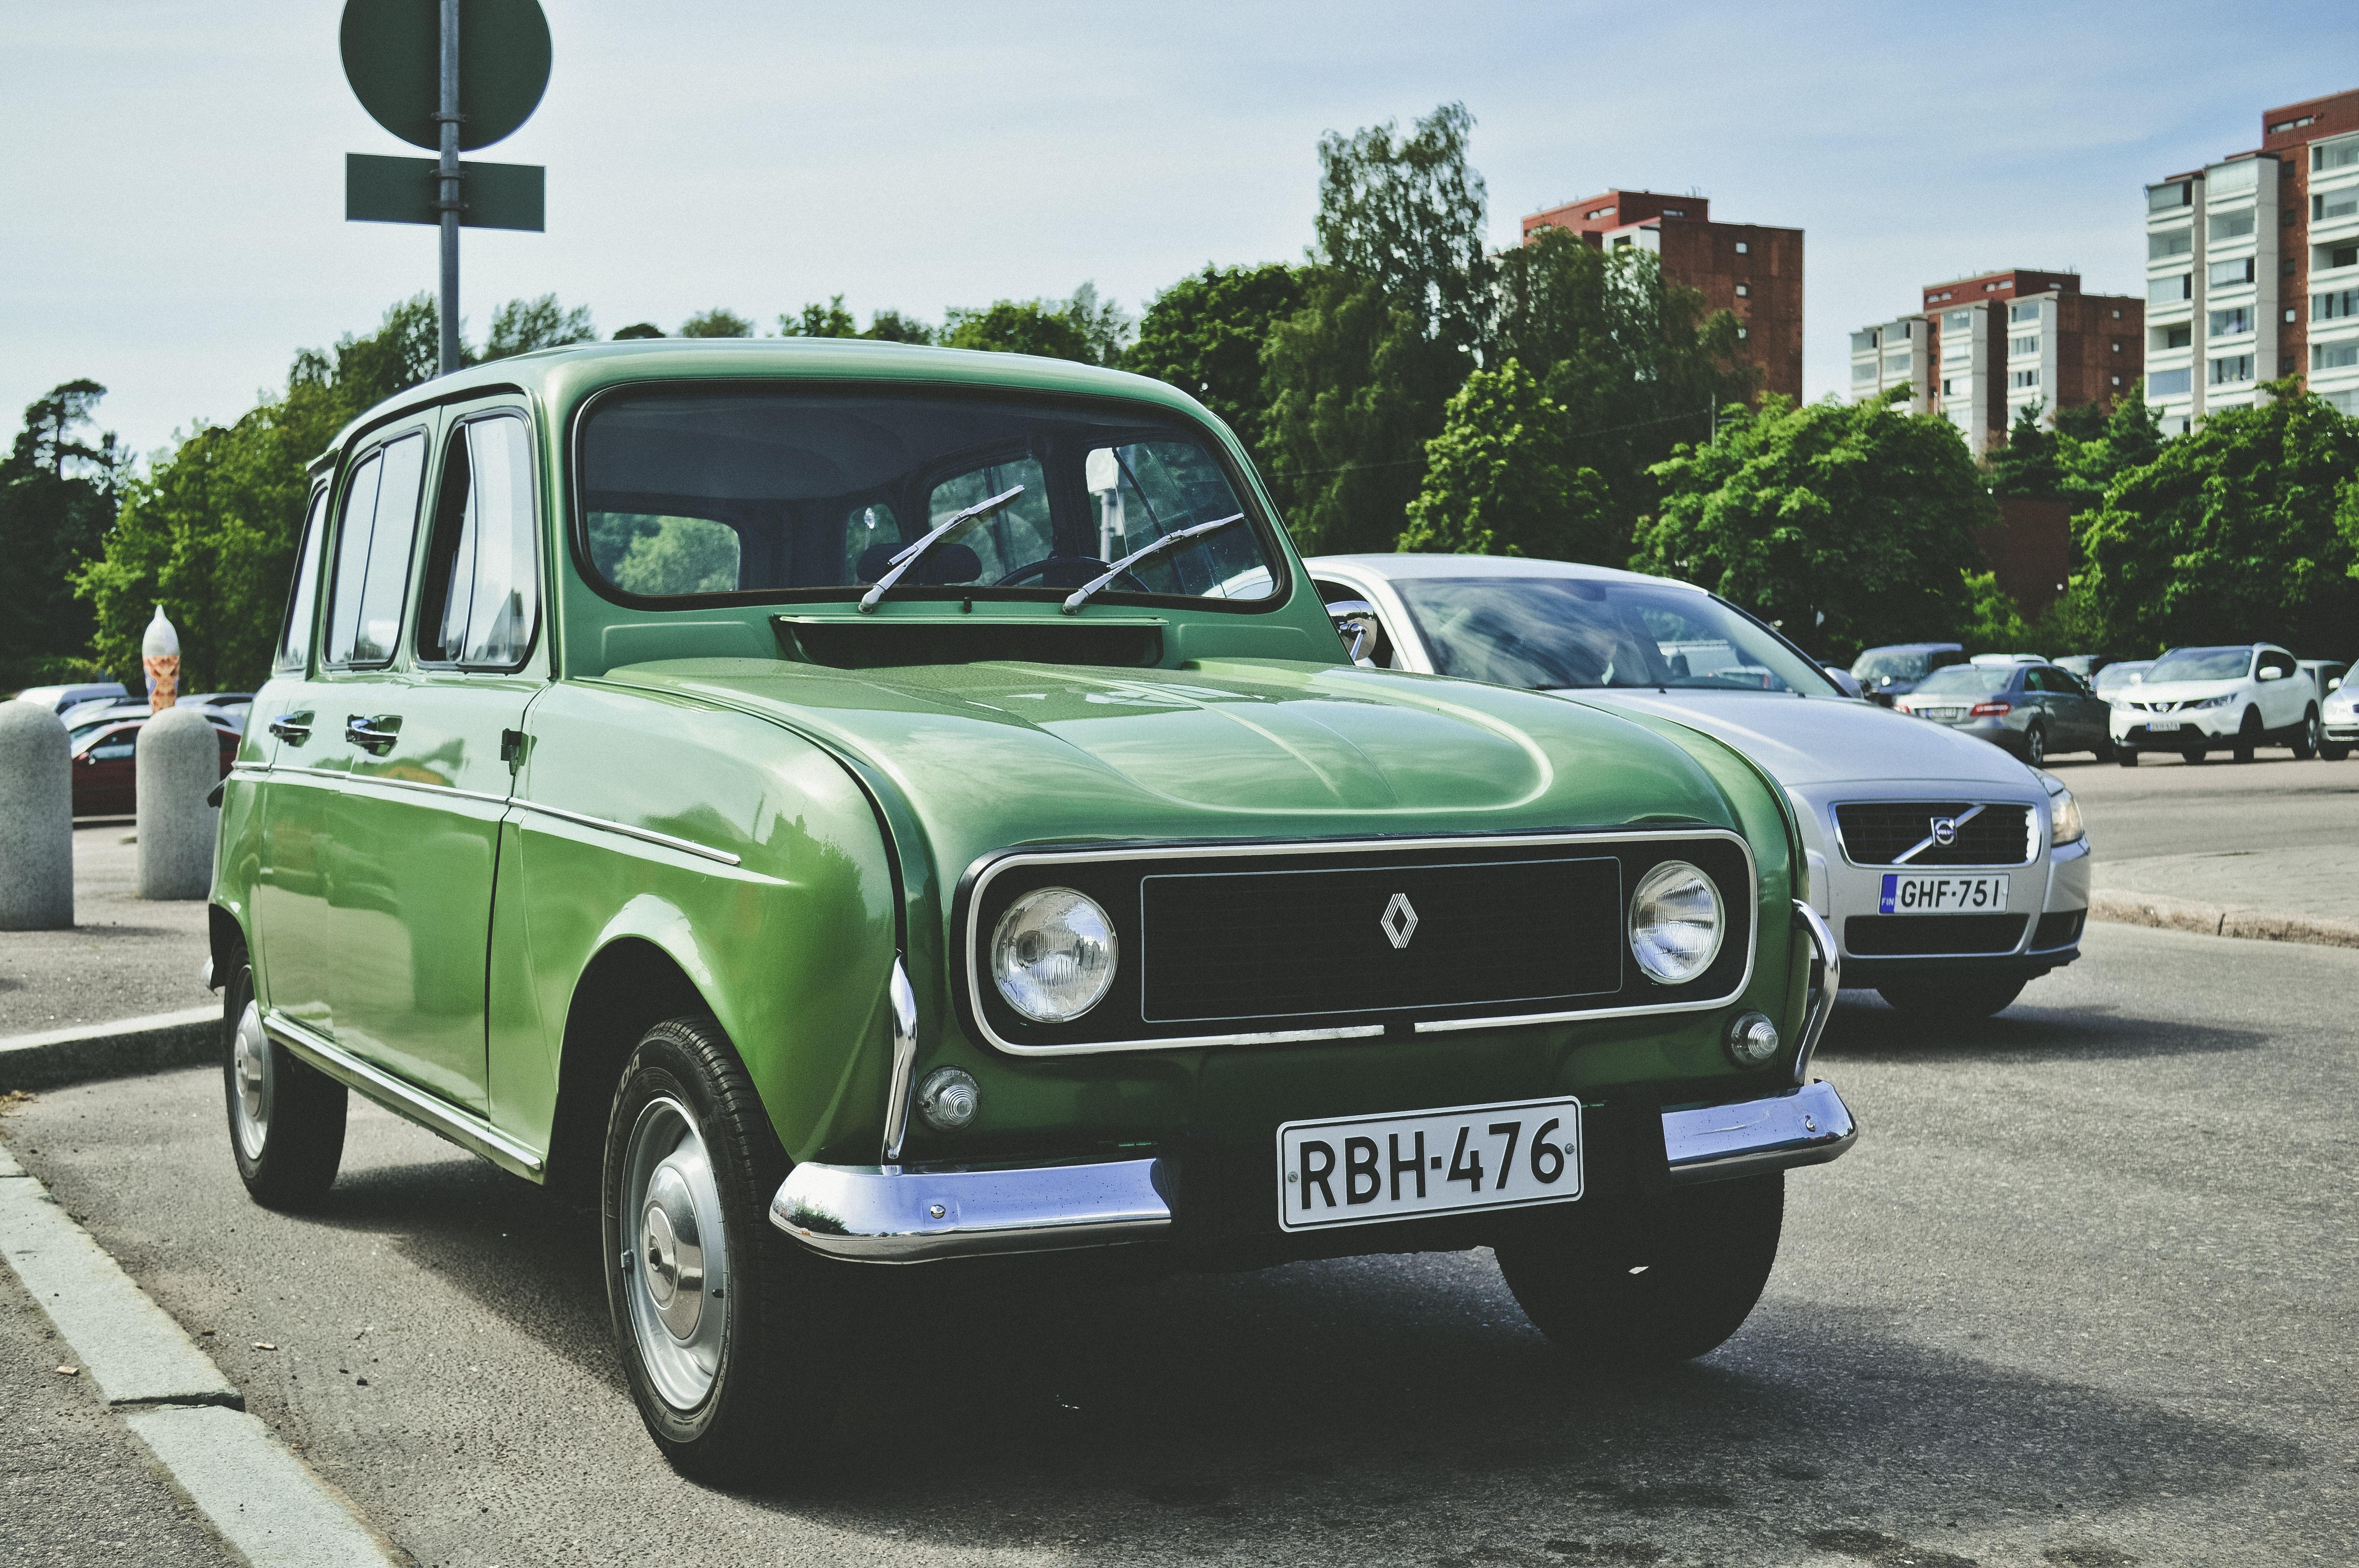 Green Renault Sedan, Asphalt, Outdoors, Vintage, Vehicles, HQ Photo